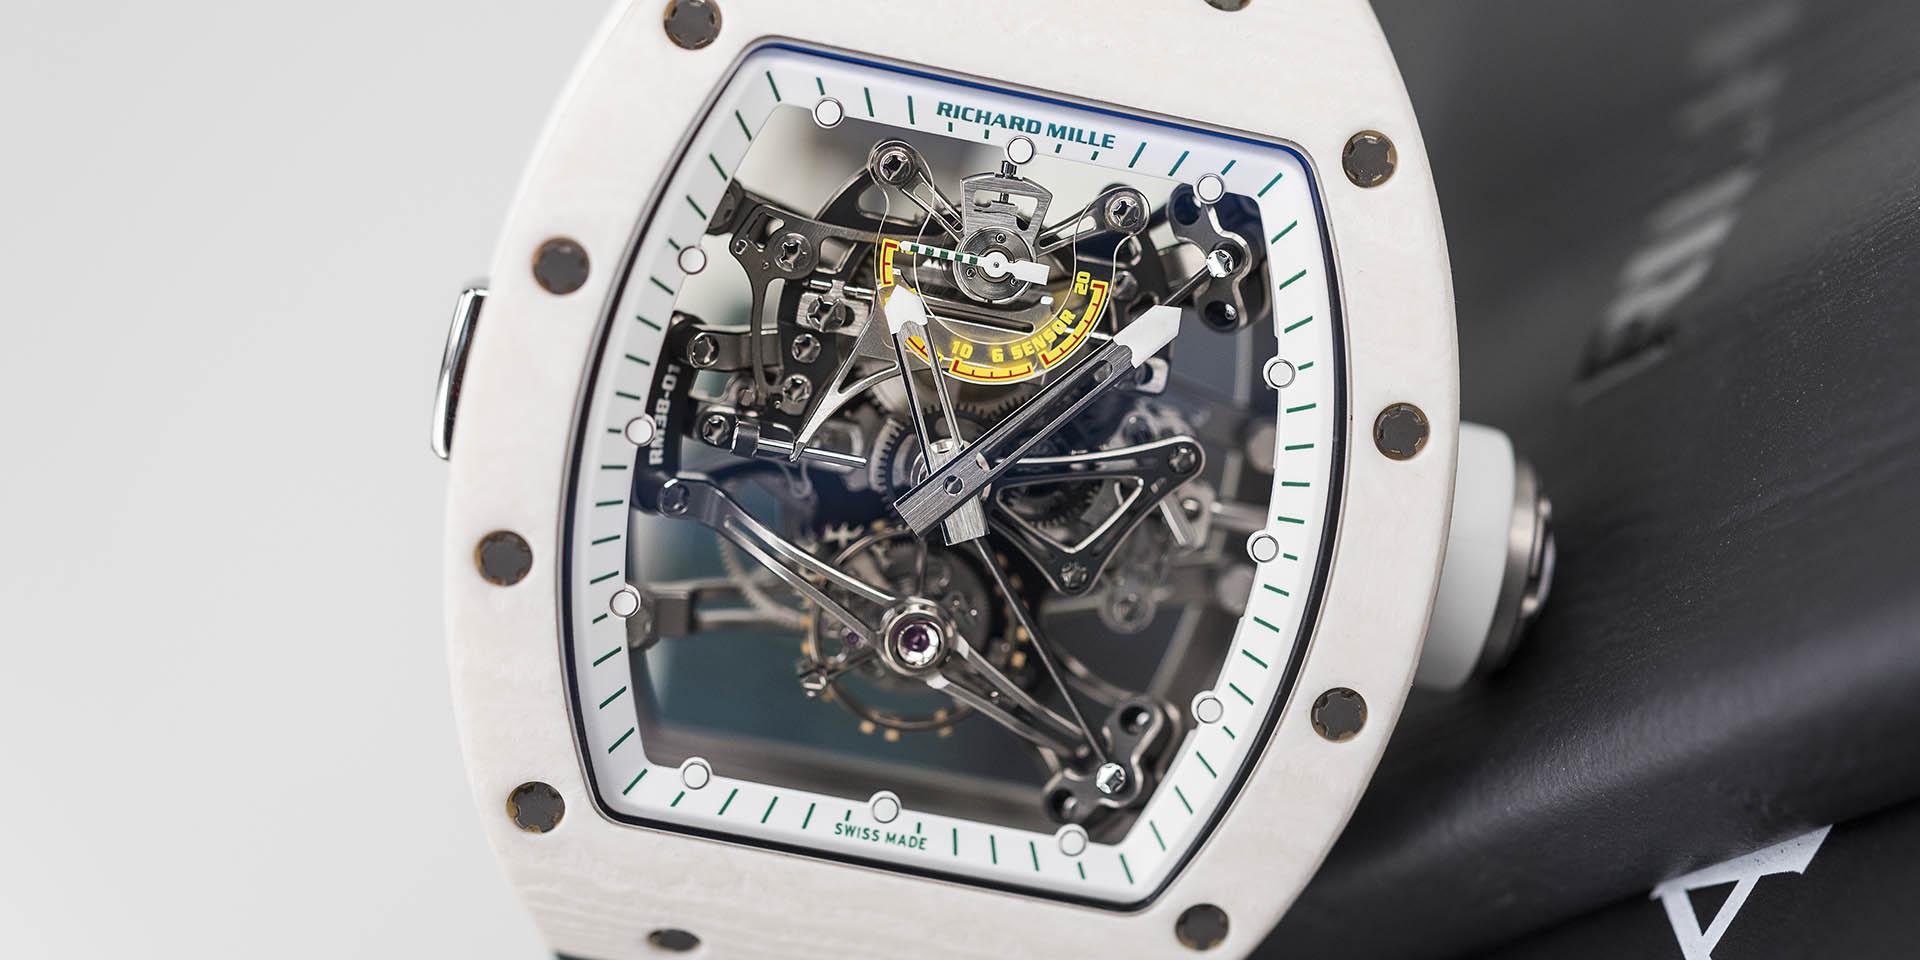 rm38-01-richard-mille-tourbillon-g-sensor-bubba-watson-5.jpg